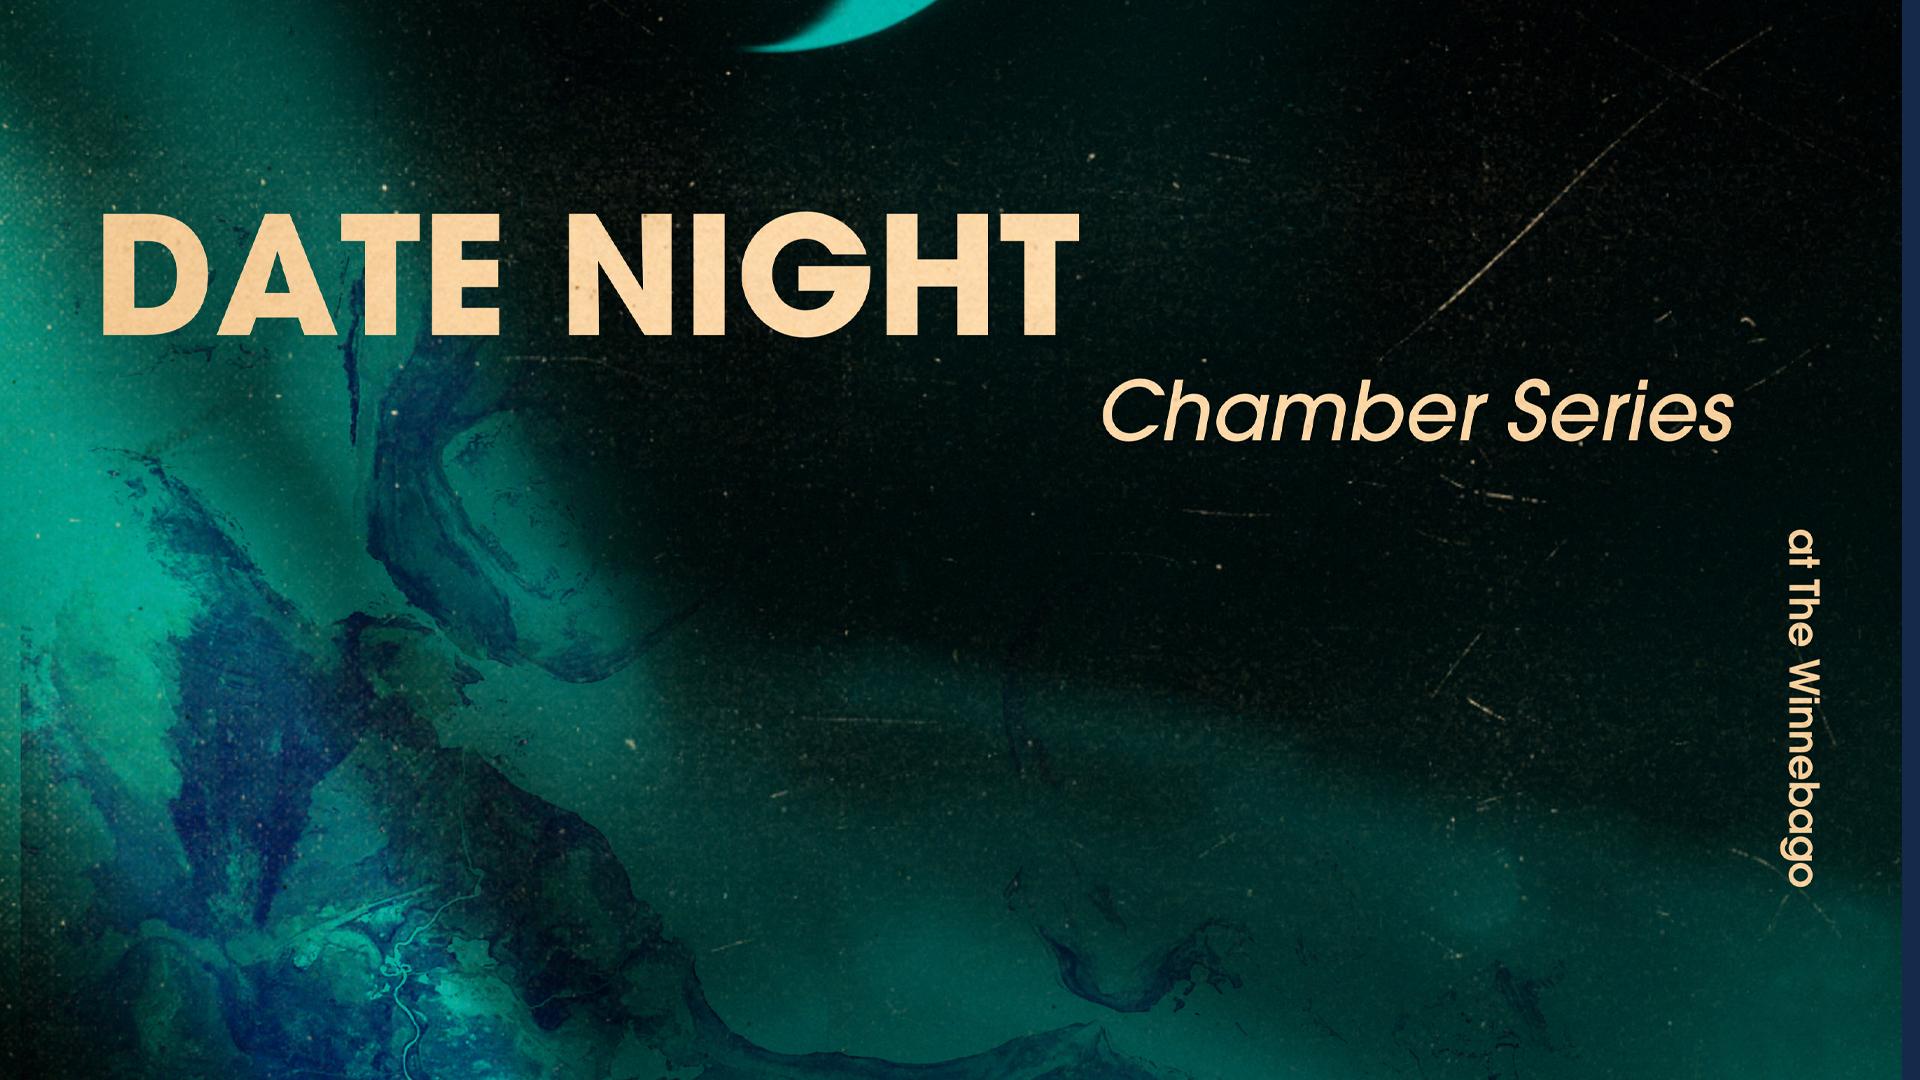 Date-Night.jpg